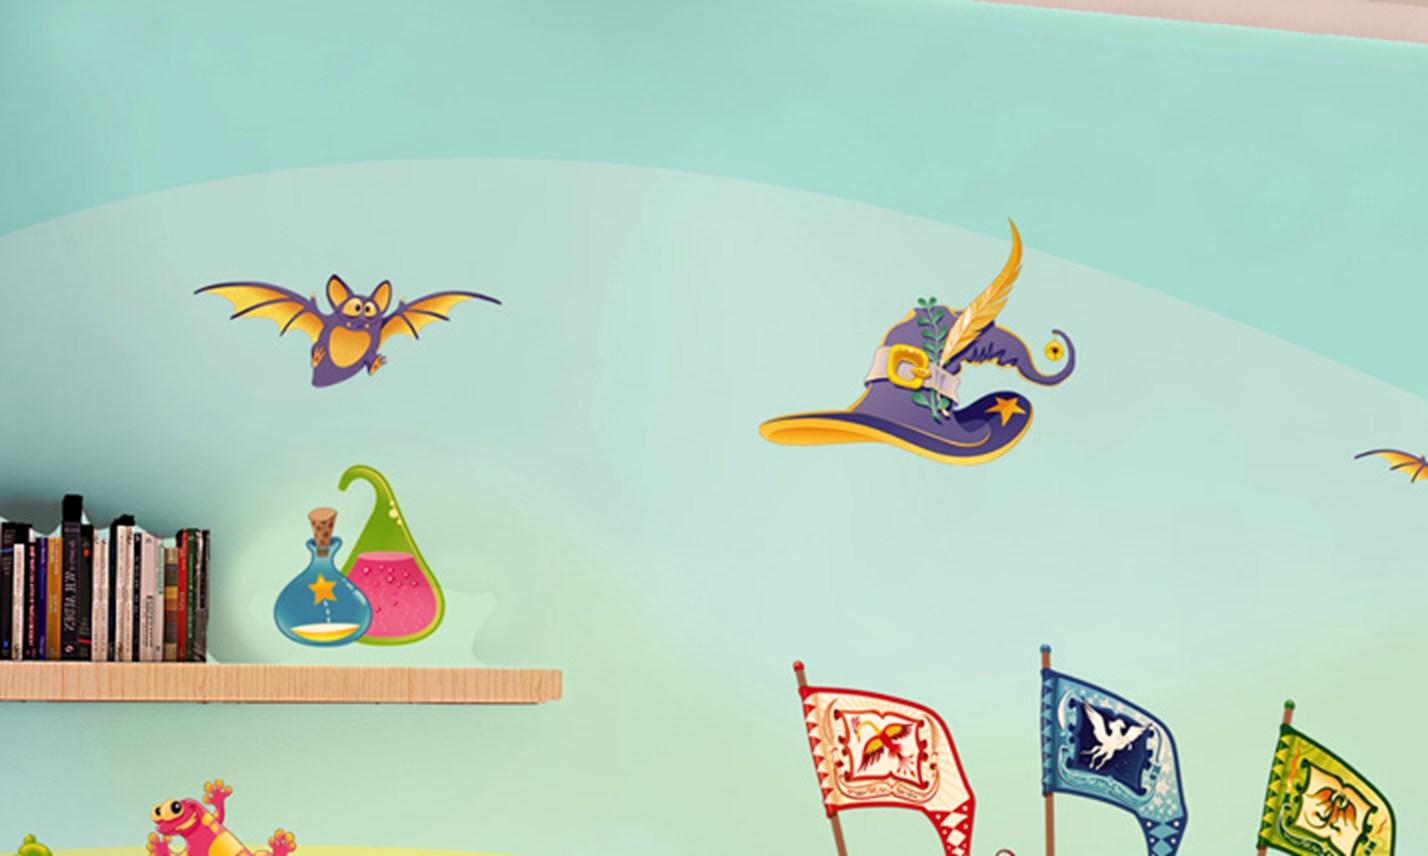 Stickers murali bambini cameretta a scuola di magia - Stickers x camerette ...